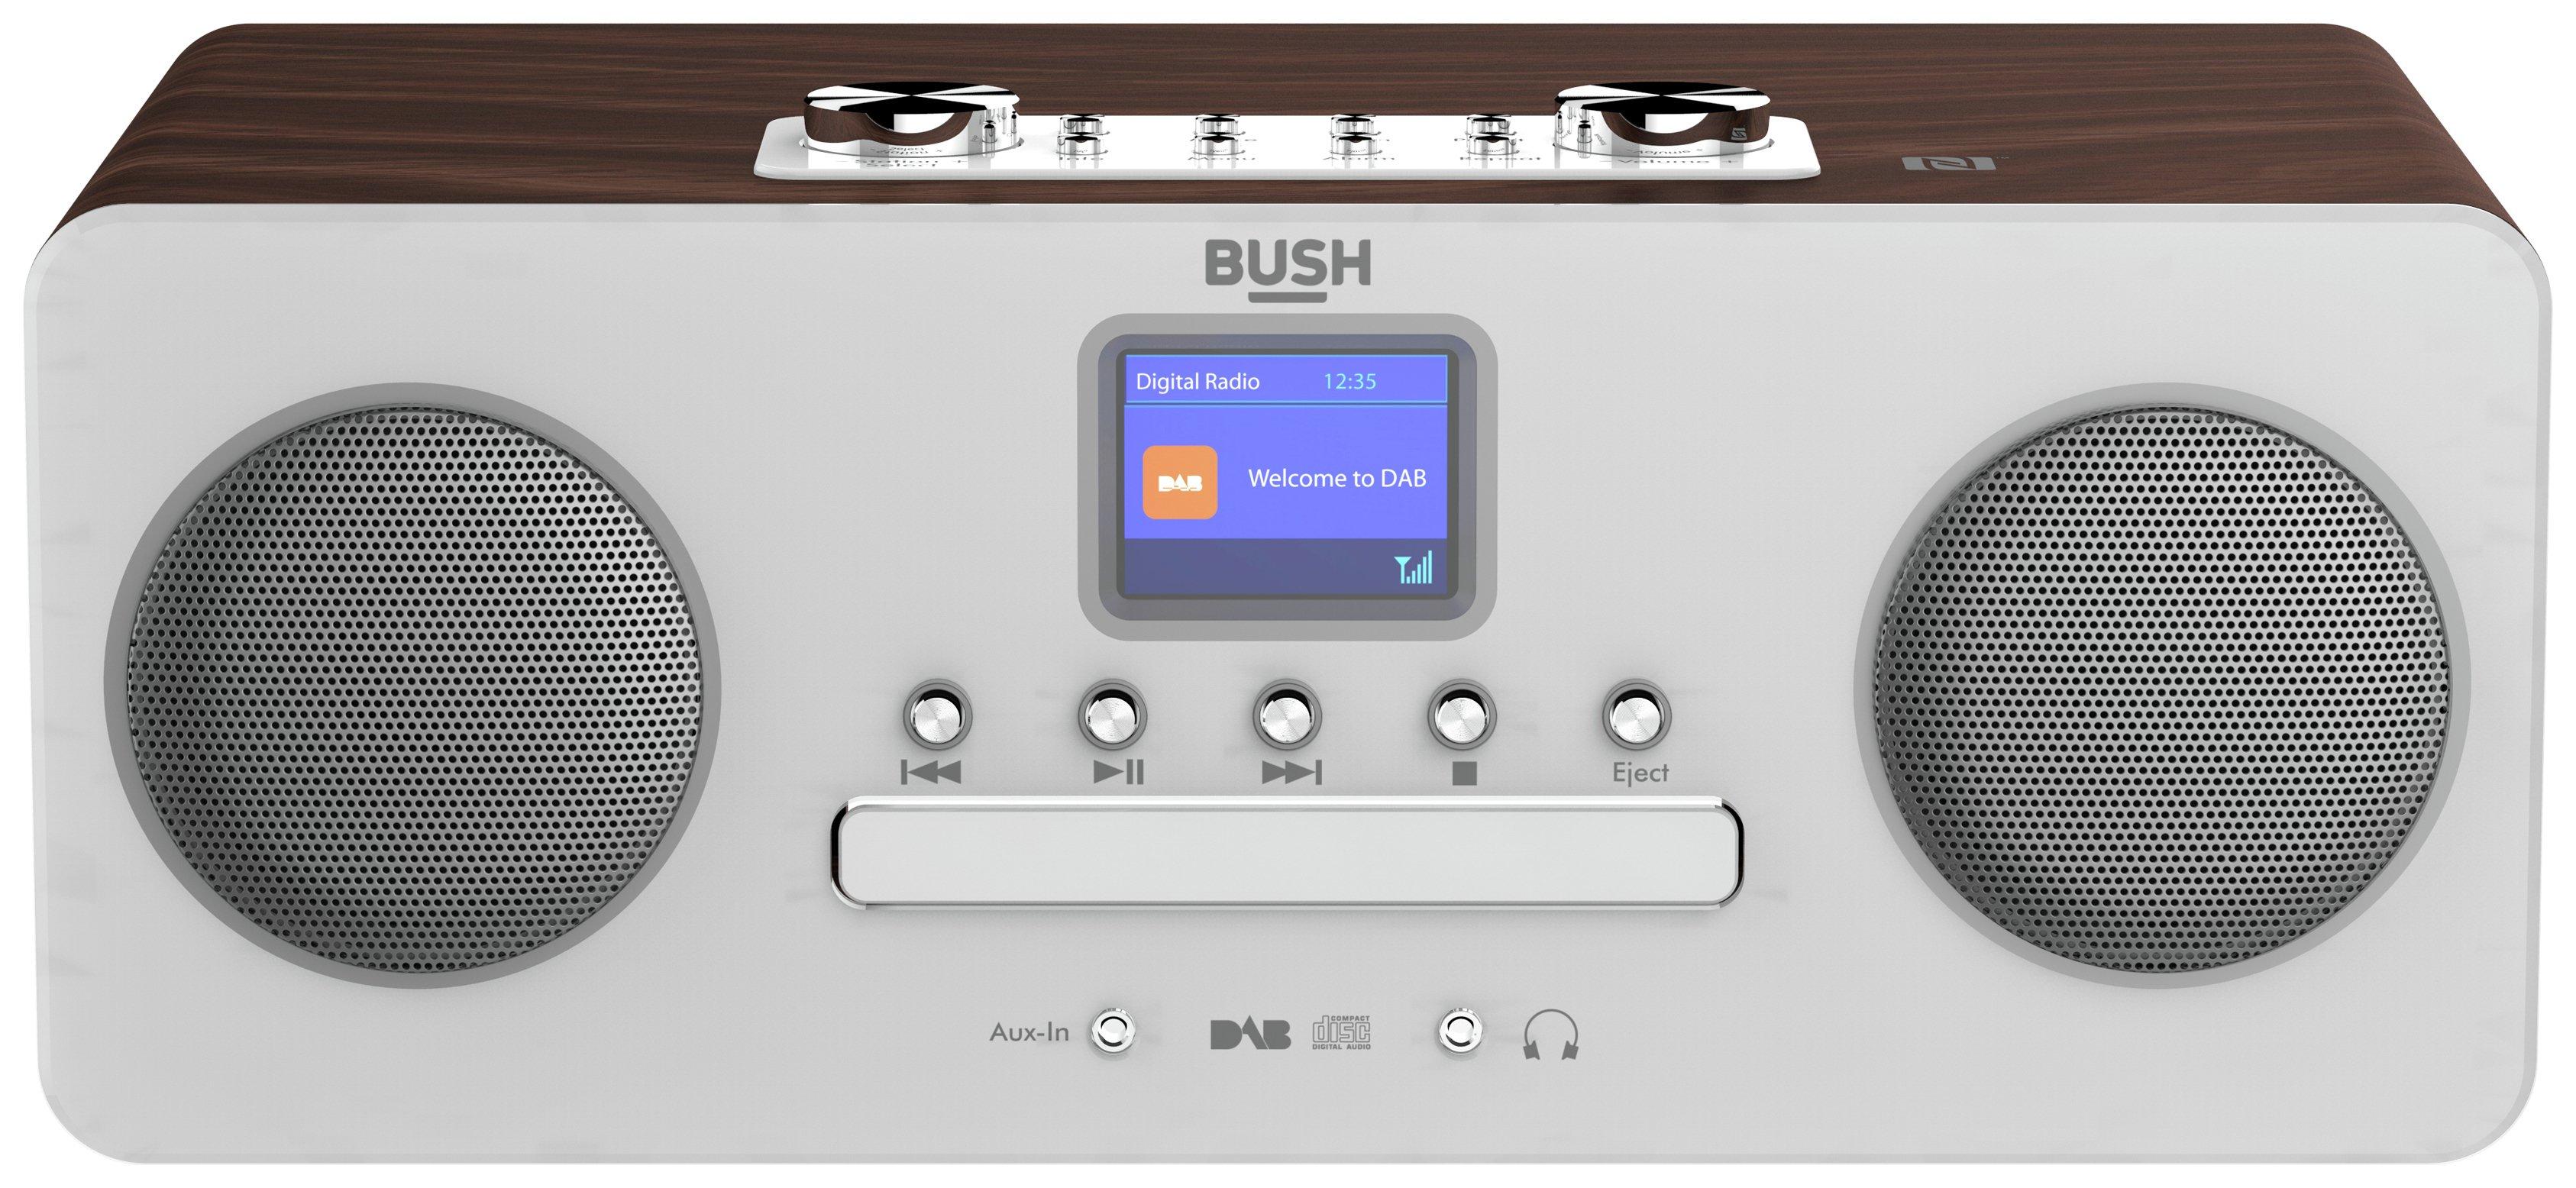 Bush - Bluetooth DAB All In One Micro Hifi System - Black/Silver